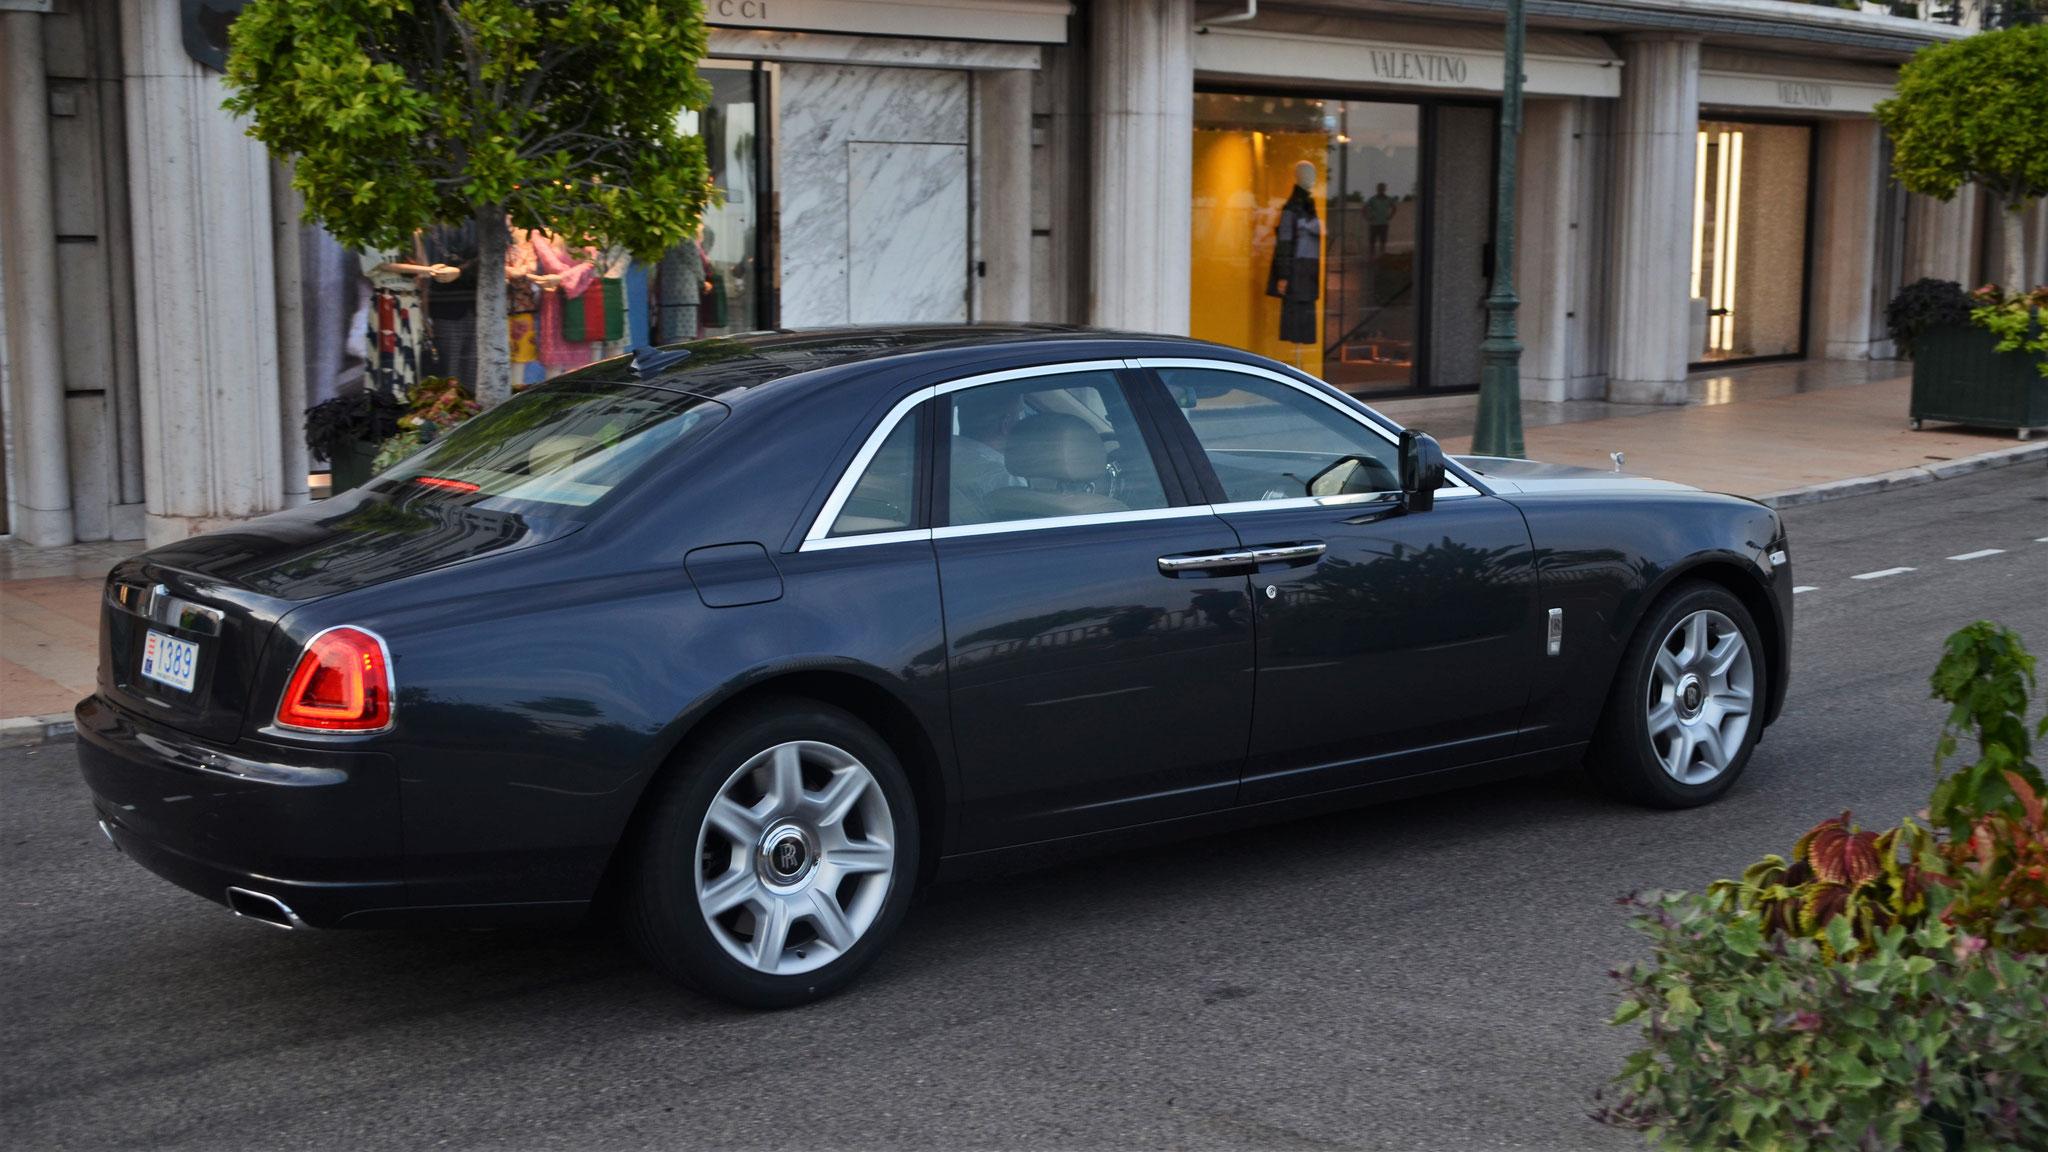 Rolls Royce Ghost Series II - 1389 (MC)